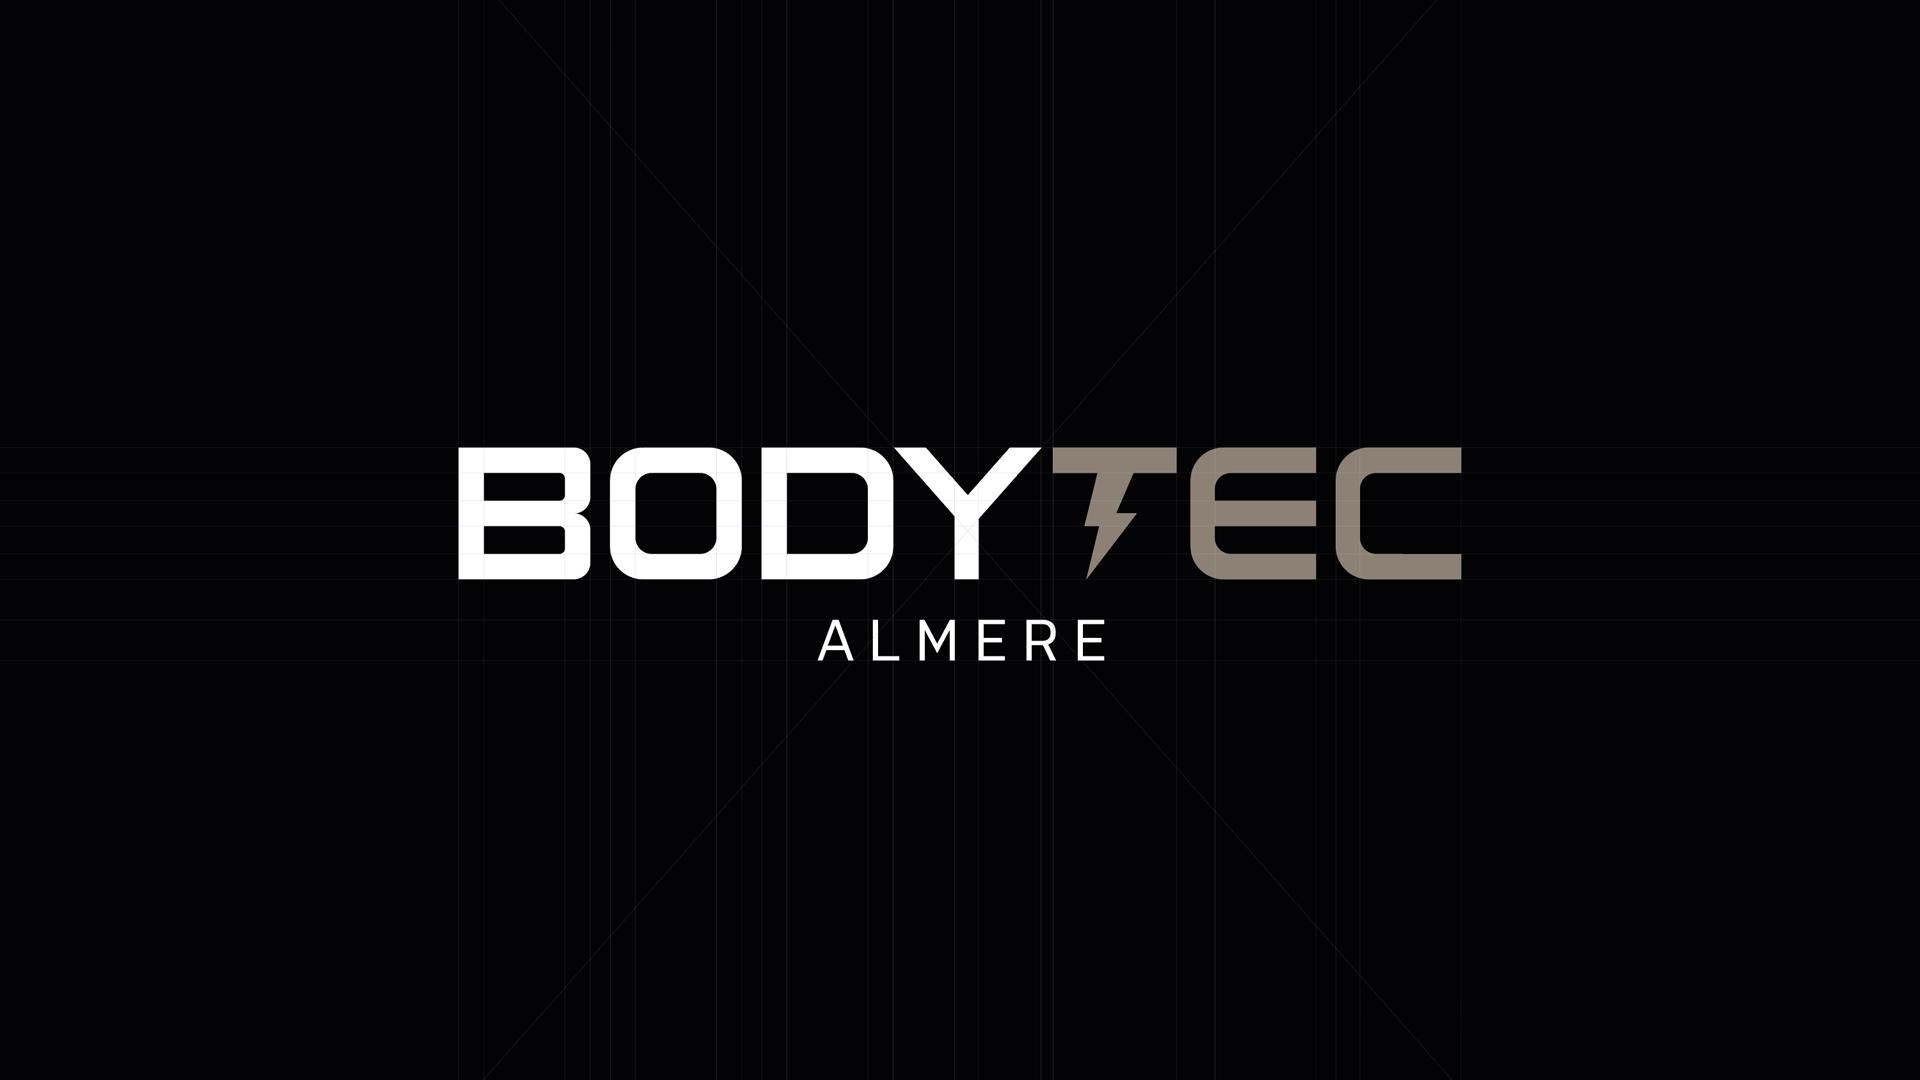 Bodytec Almere foto 2